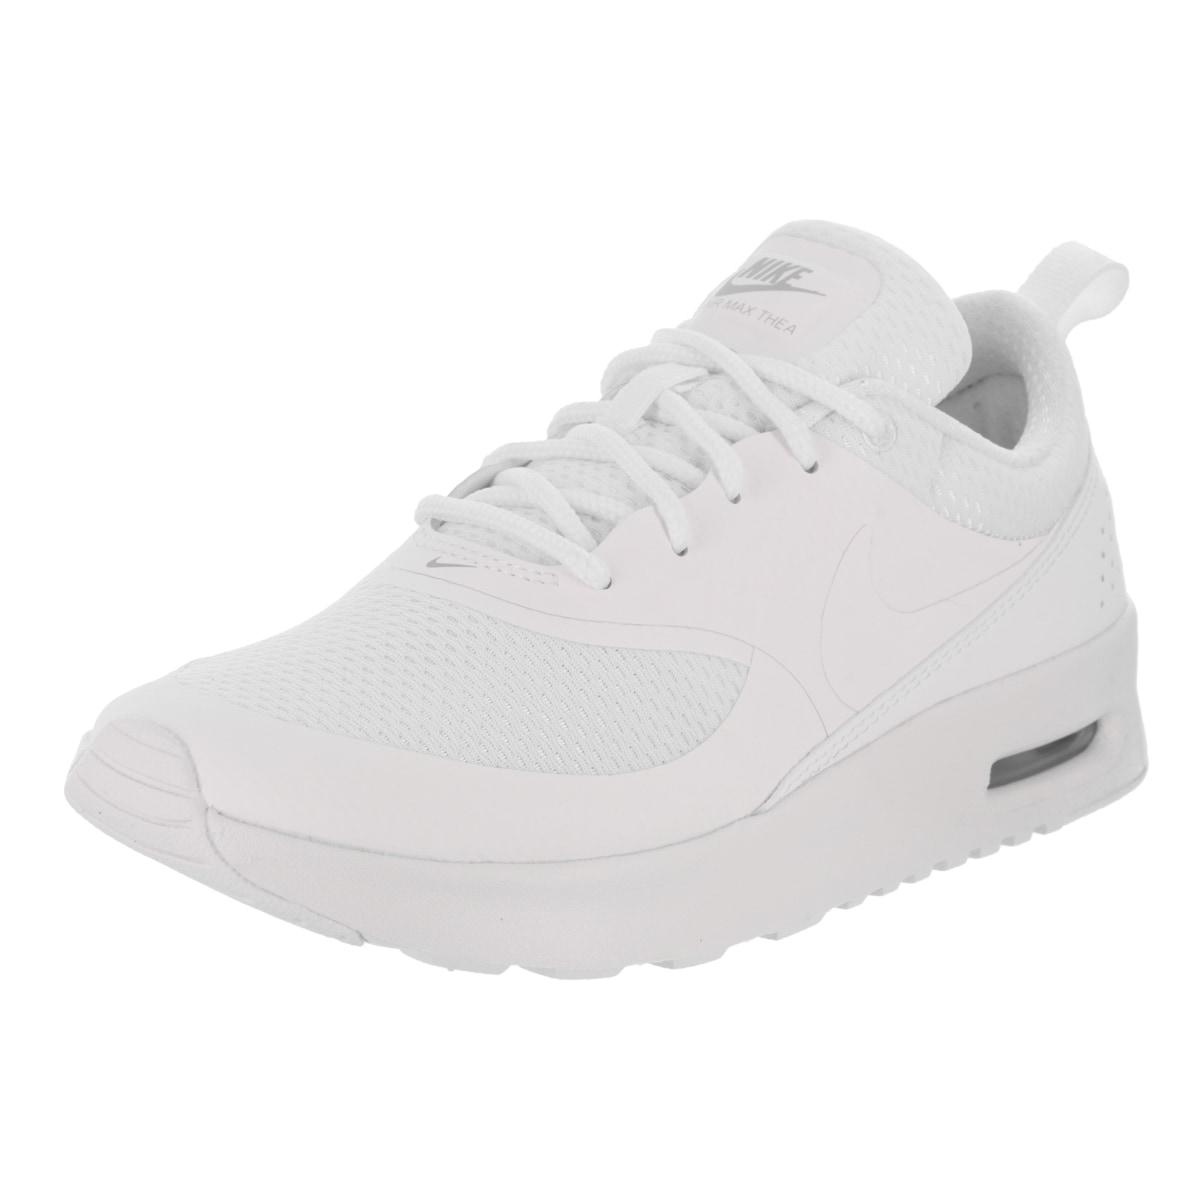 Nike Kids Air Max Thea (PS) Running Shoe (11), Boy's, Whi...